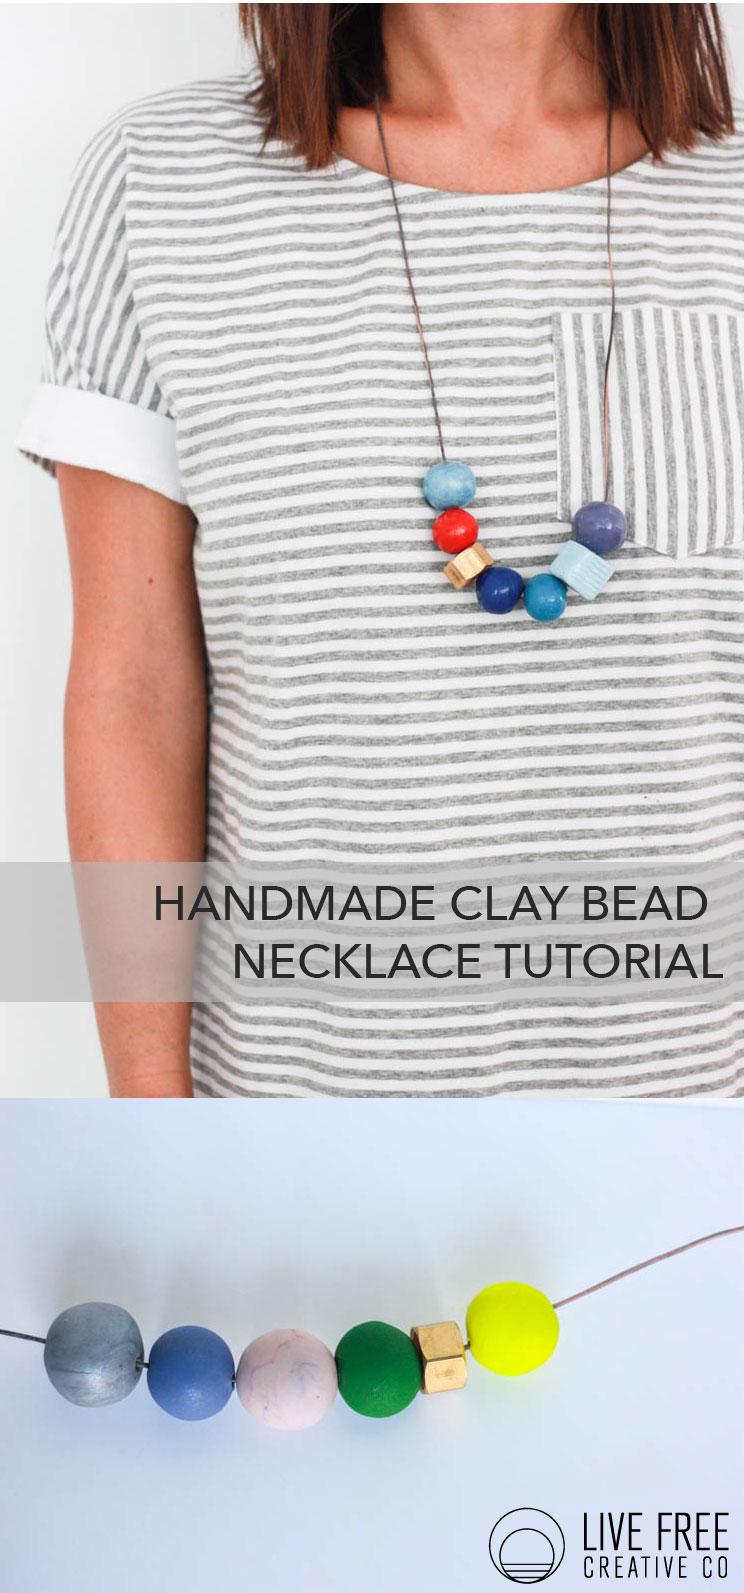 Handmade Clay Bead Necklace- Live Free Creative Co